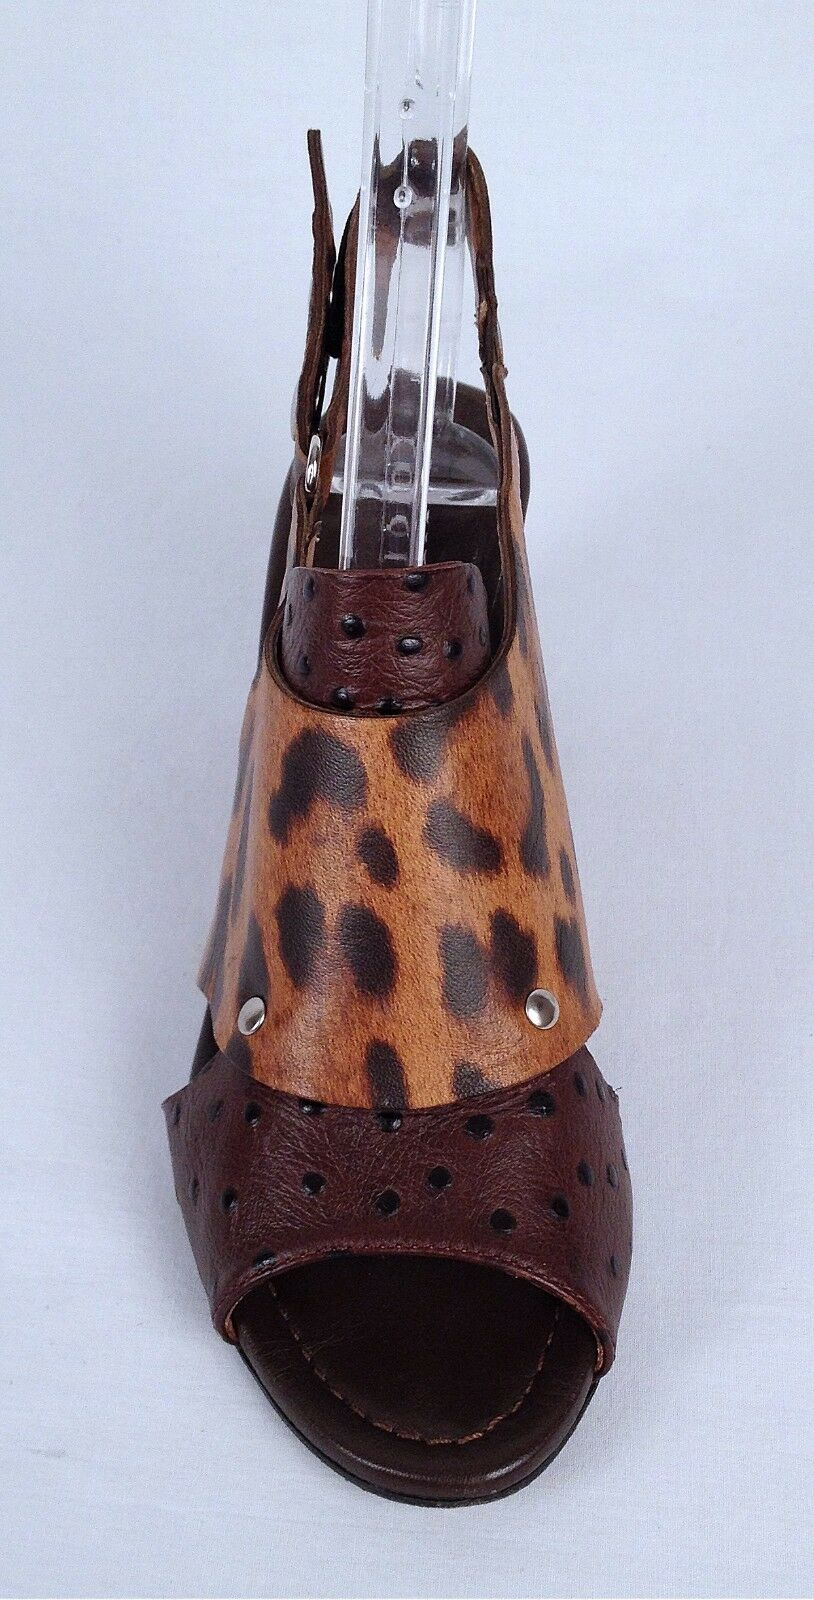 Anyi Lu 'Rialta' 'Rialta' 'Rialta' Sandal- Print  Brown- Size 6 US  36 EU -  425  (P20) d7170c